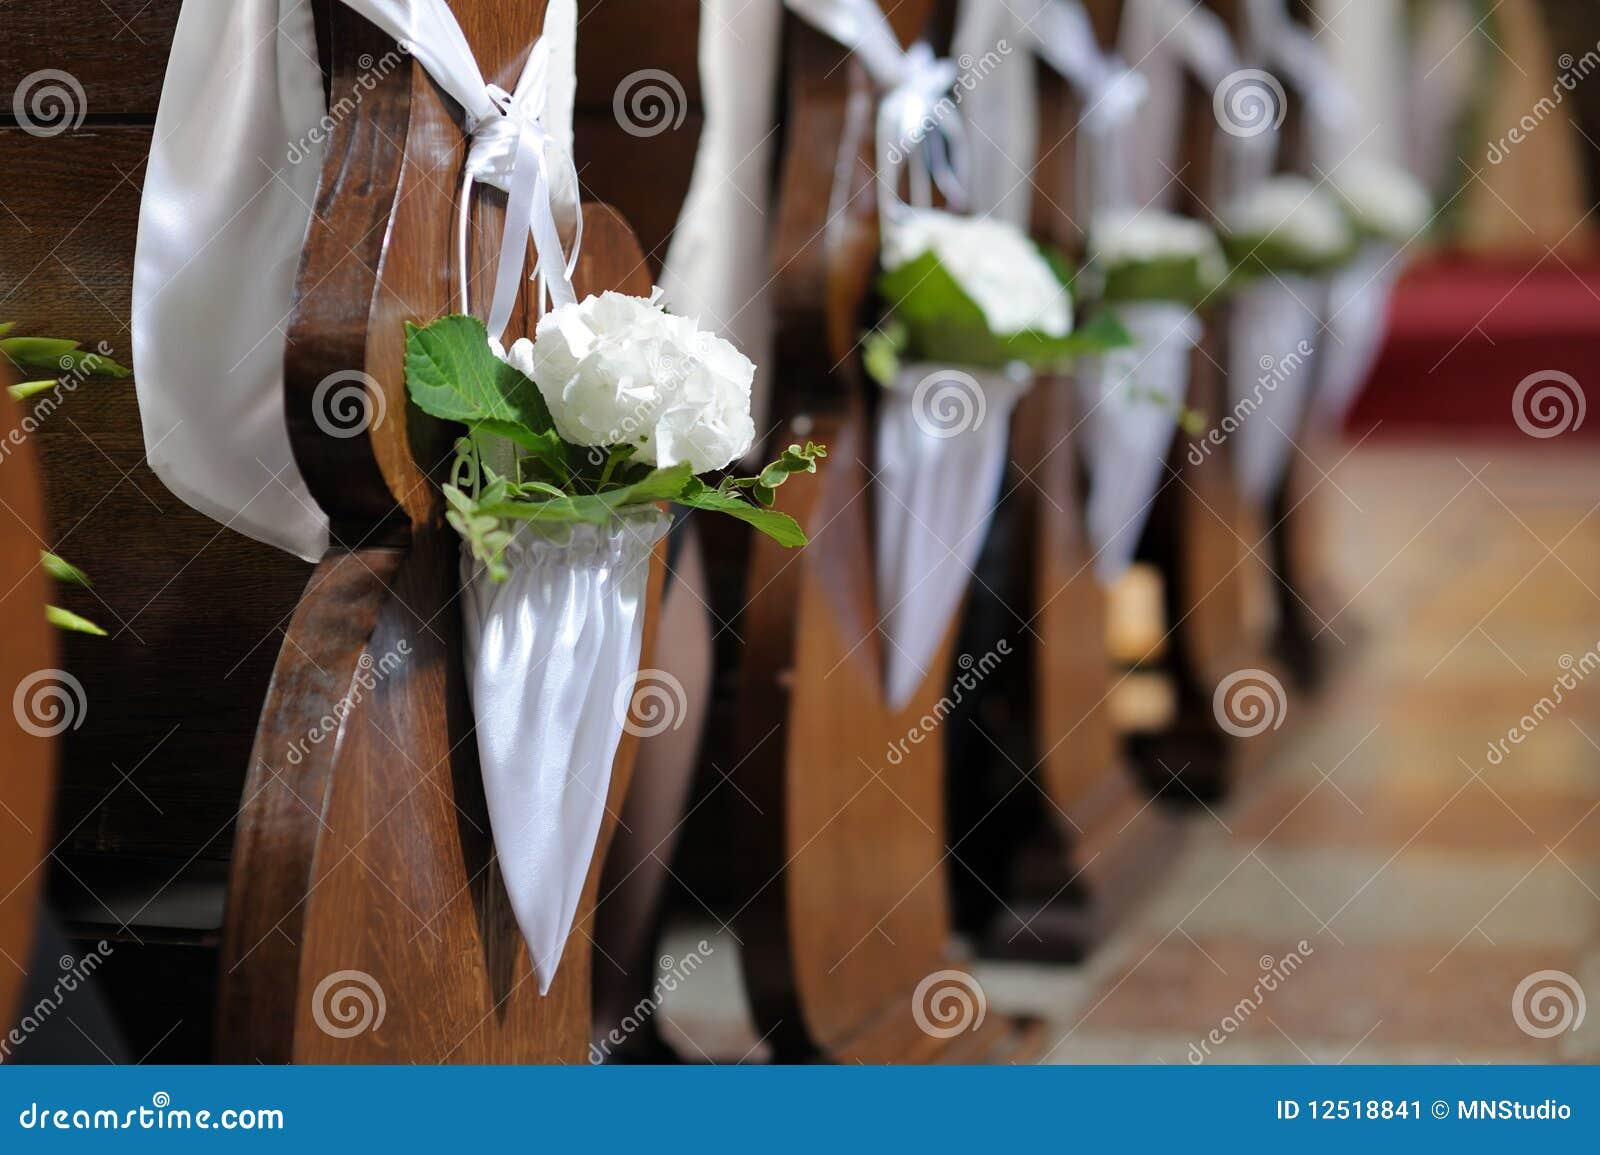 decoracao branca casamento : decoracao branca casamento:Decoração Do Casamento Da Flor Branca Imagem de Stock – Imagem